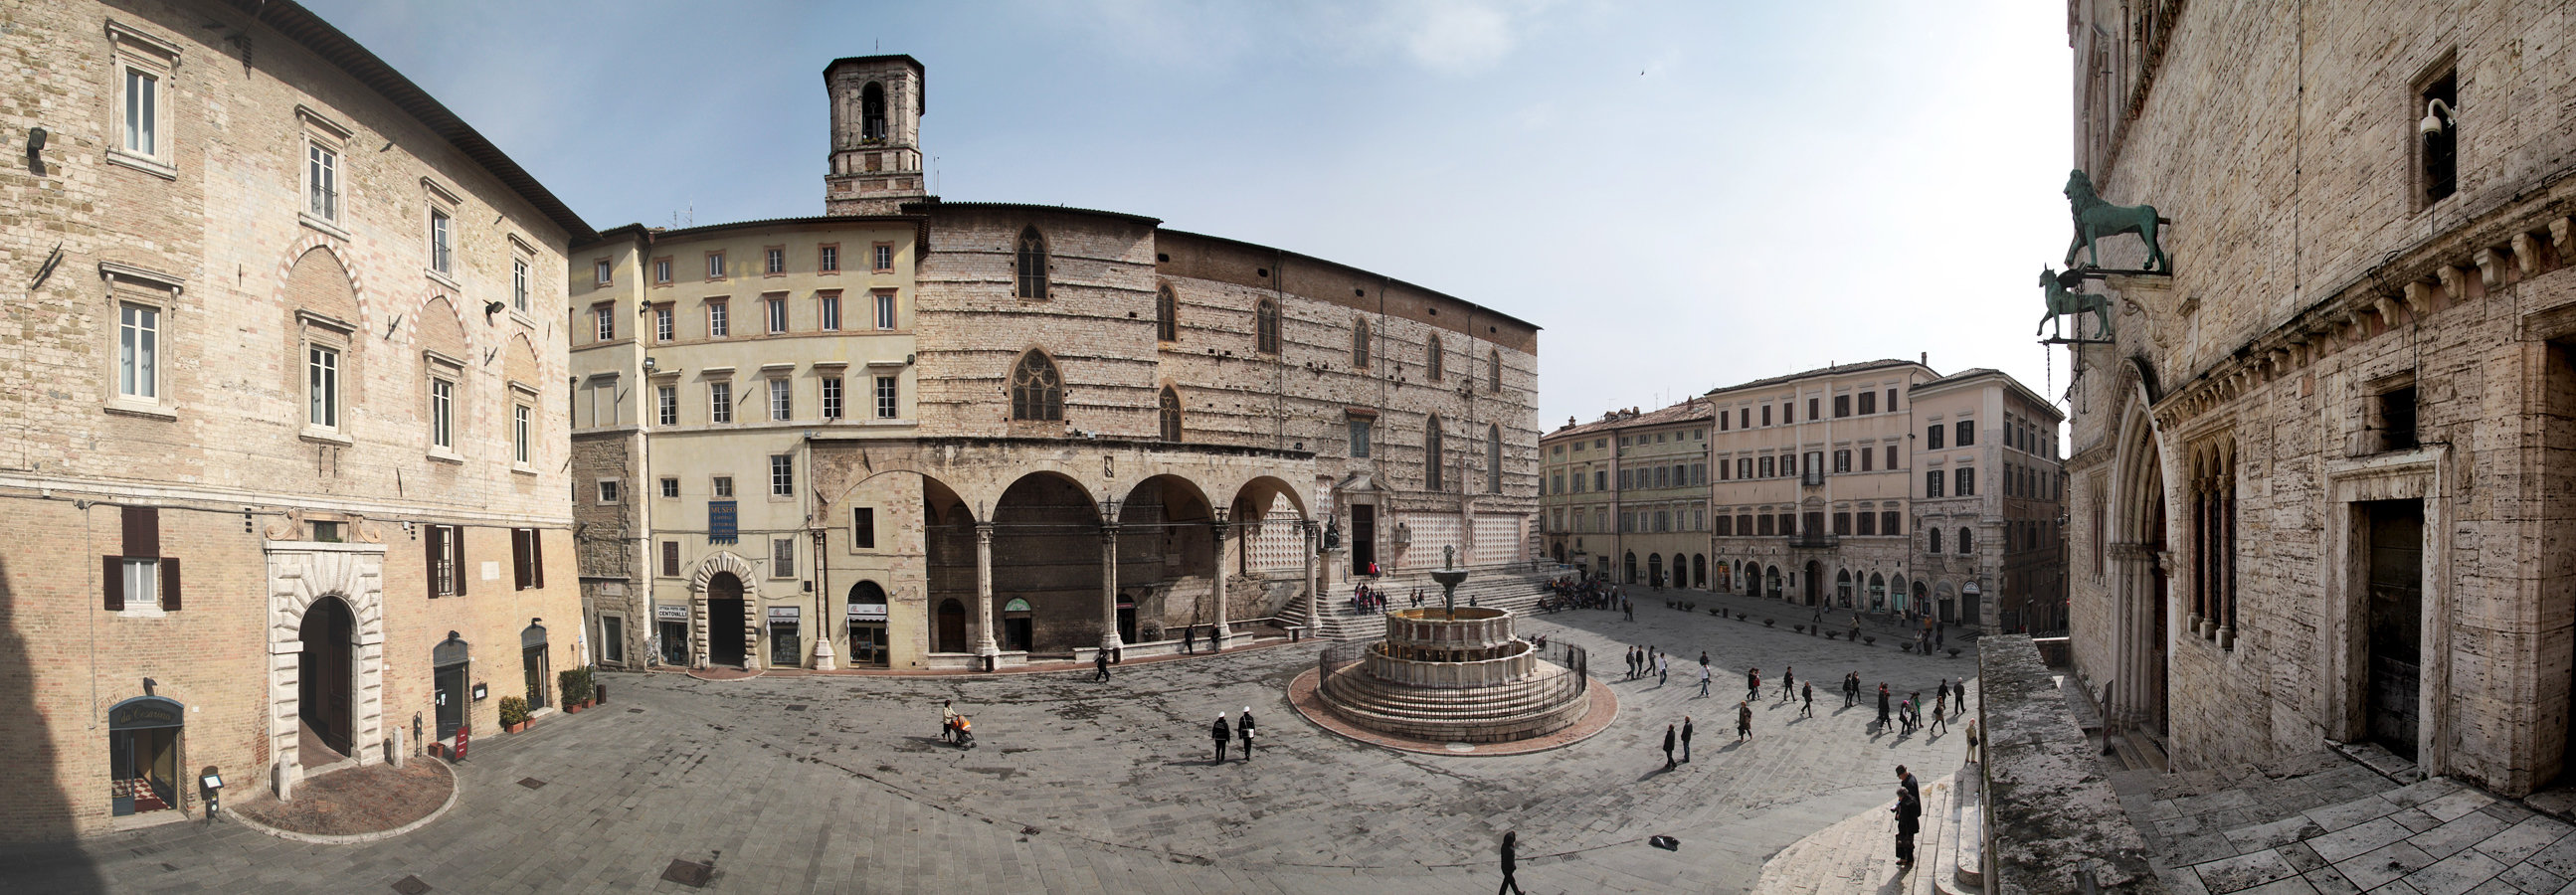 Perugia - Wikipedia